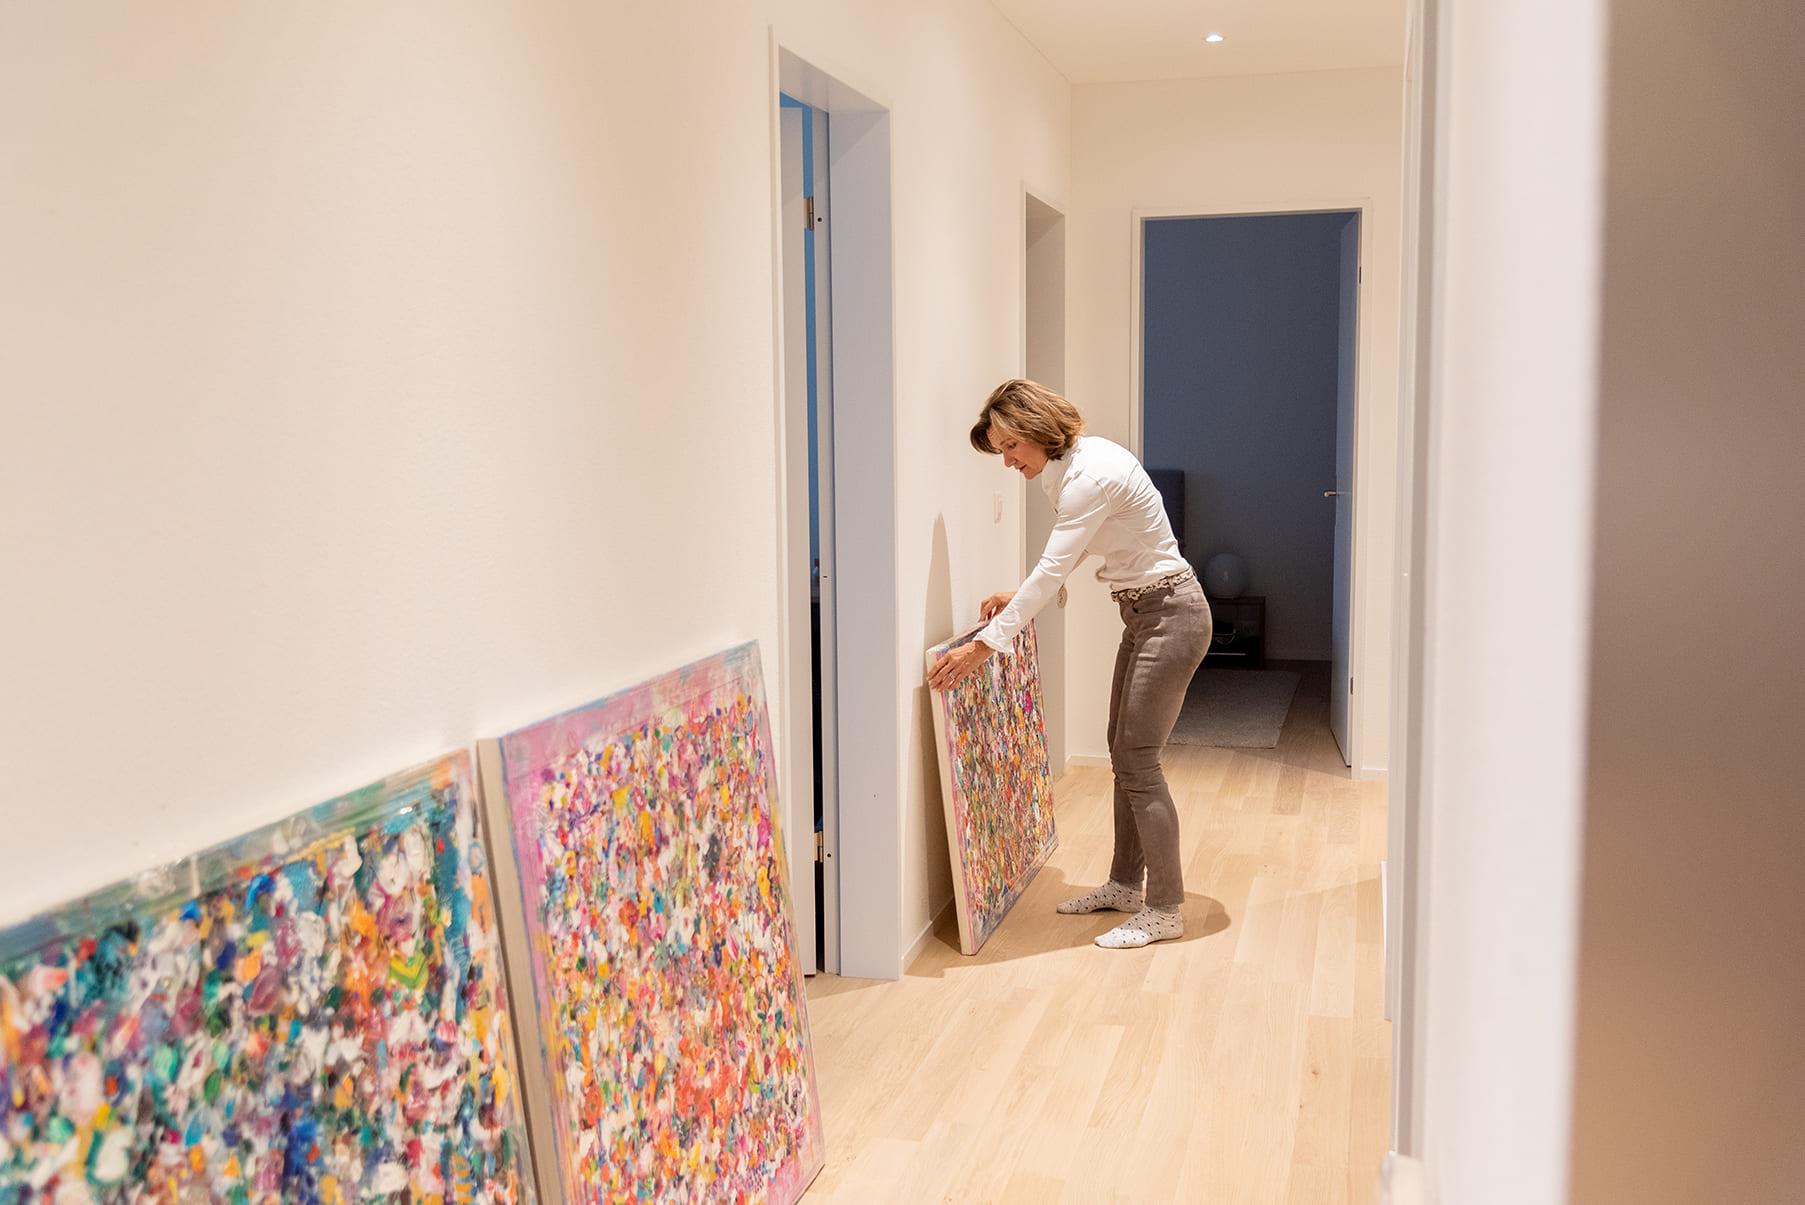 next-ART Myriam Waldvogel